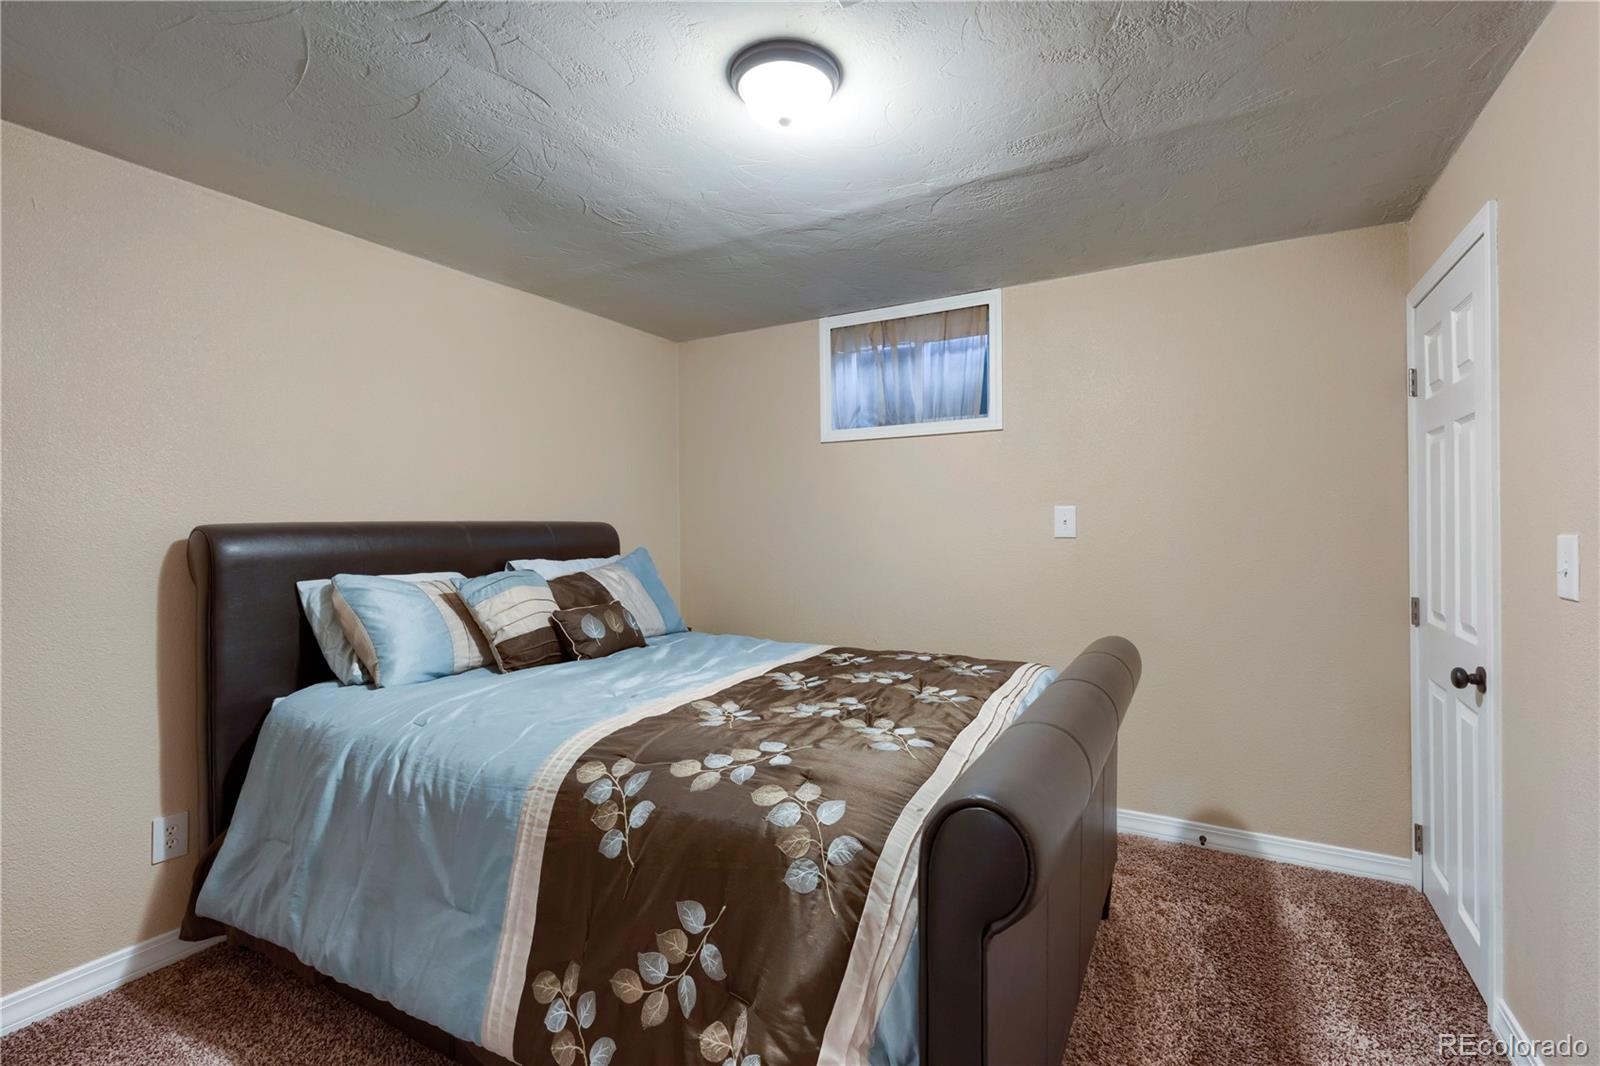 MLS# 2285262 - 21 - 4613 W 5th Street, Greeley, CO 80634